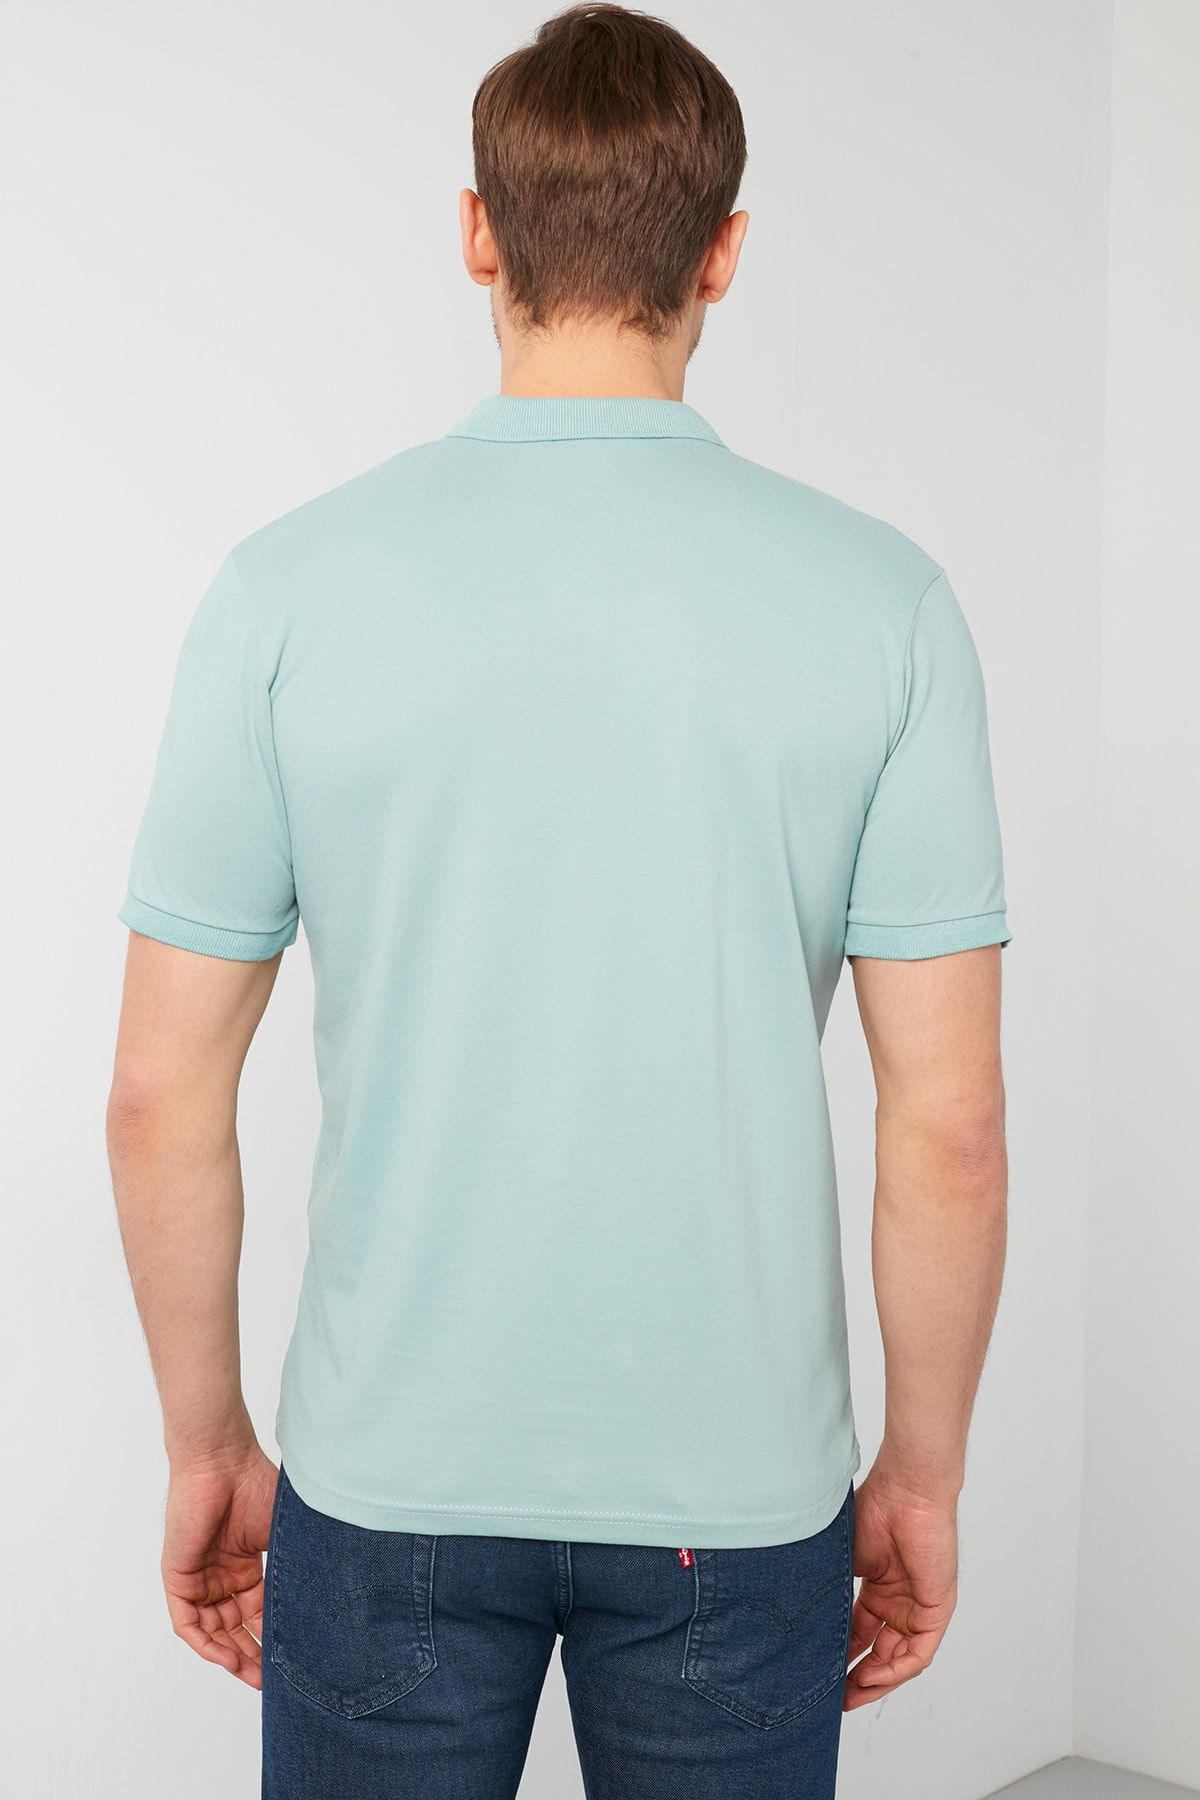 Buratti Pamuklu Düğmeli Polo T Shirt 0438101 3